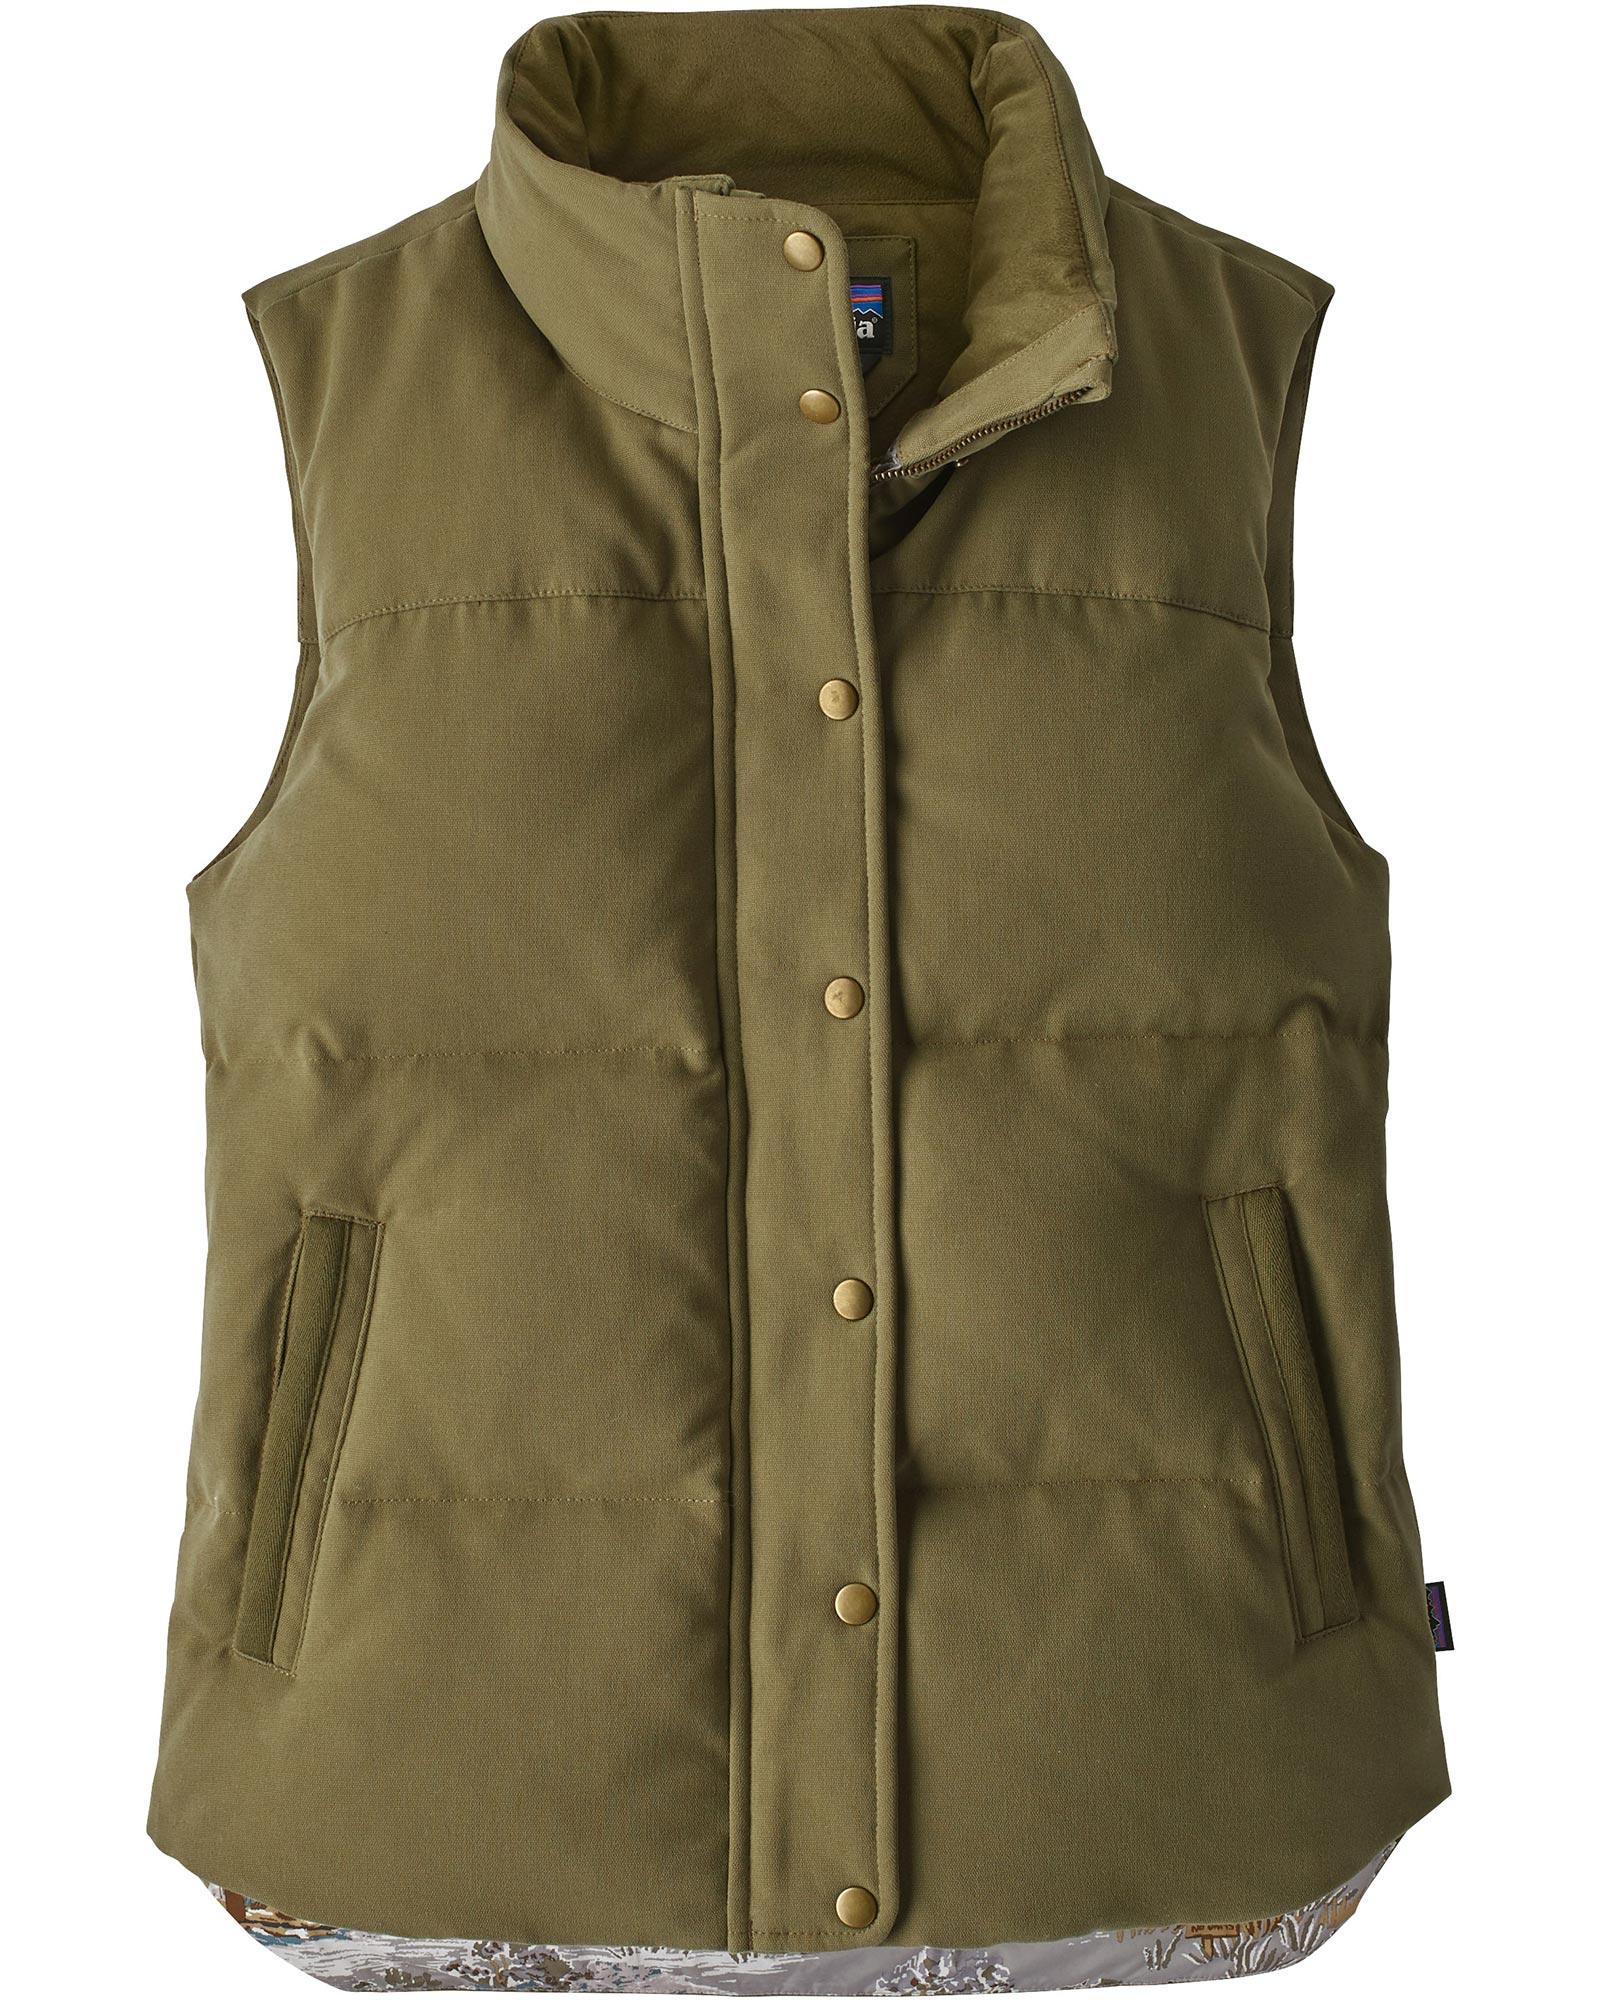 Patagonia Women's Bivy Vest 0